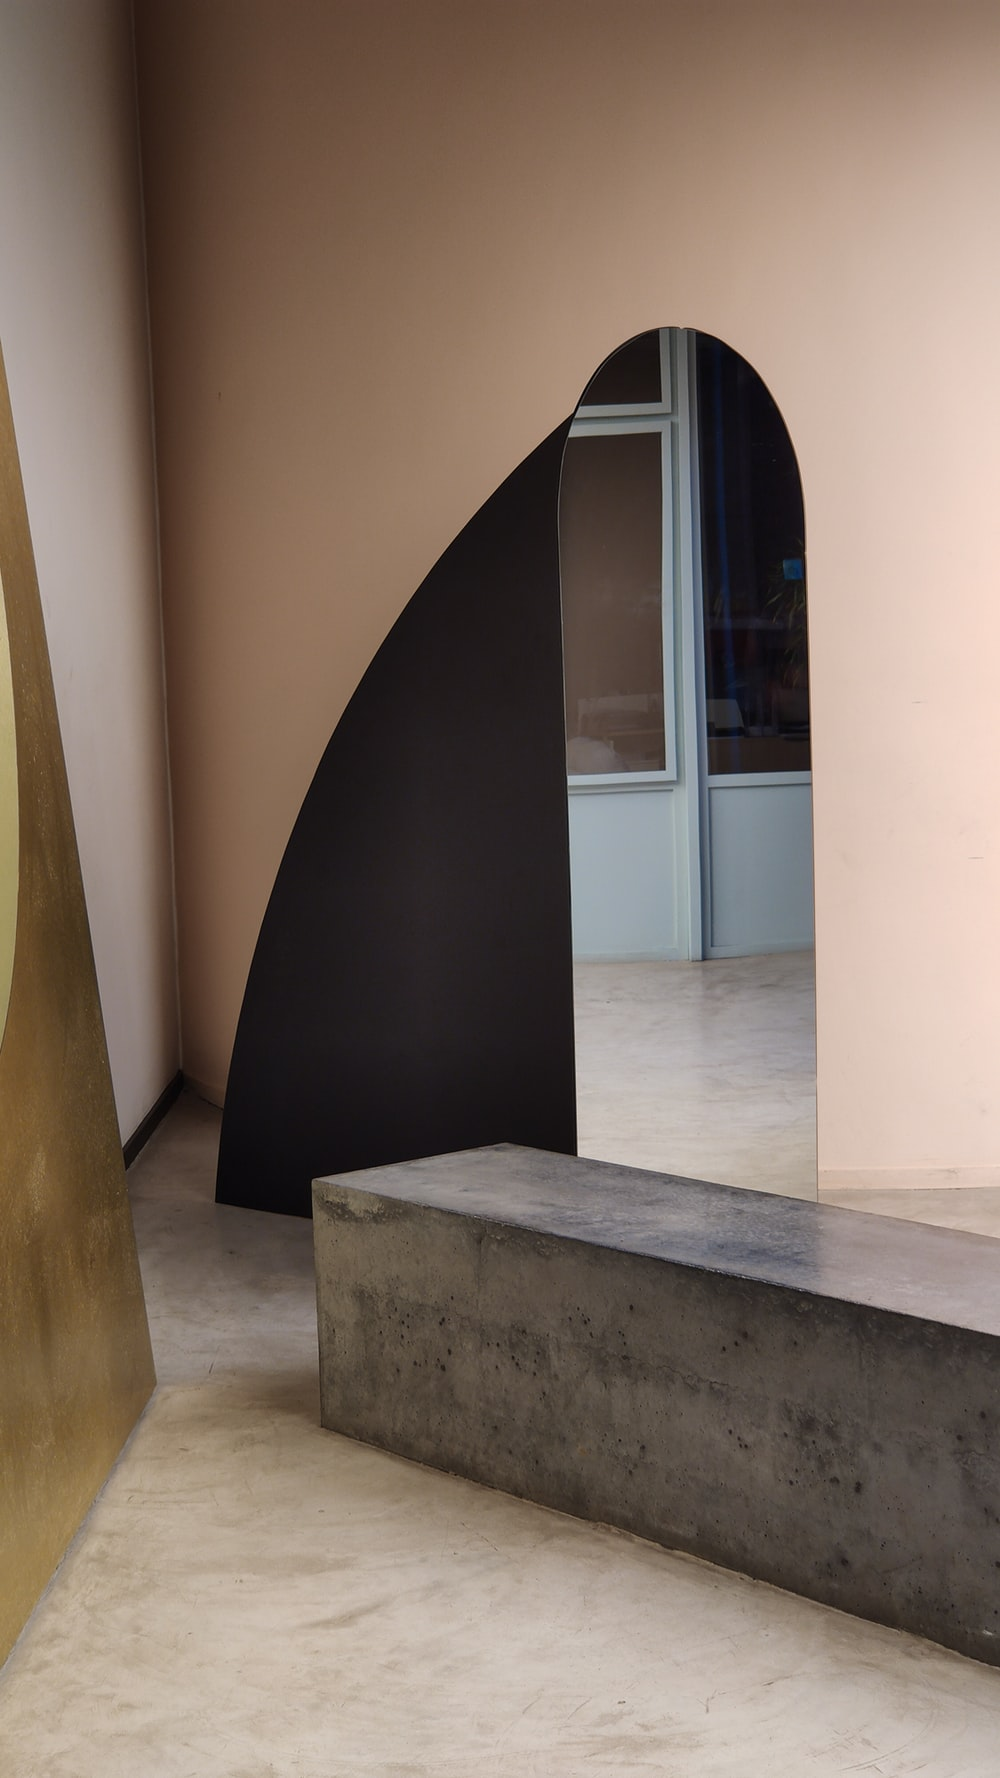 mirror near gray wooden bench